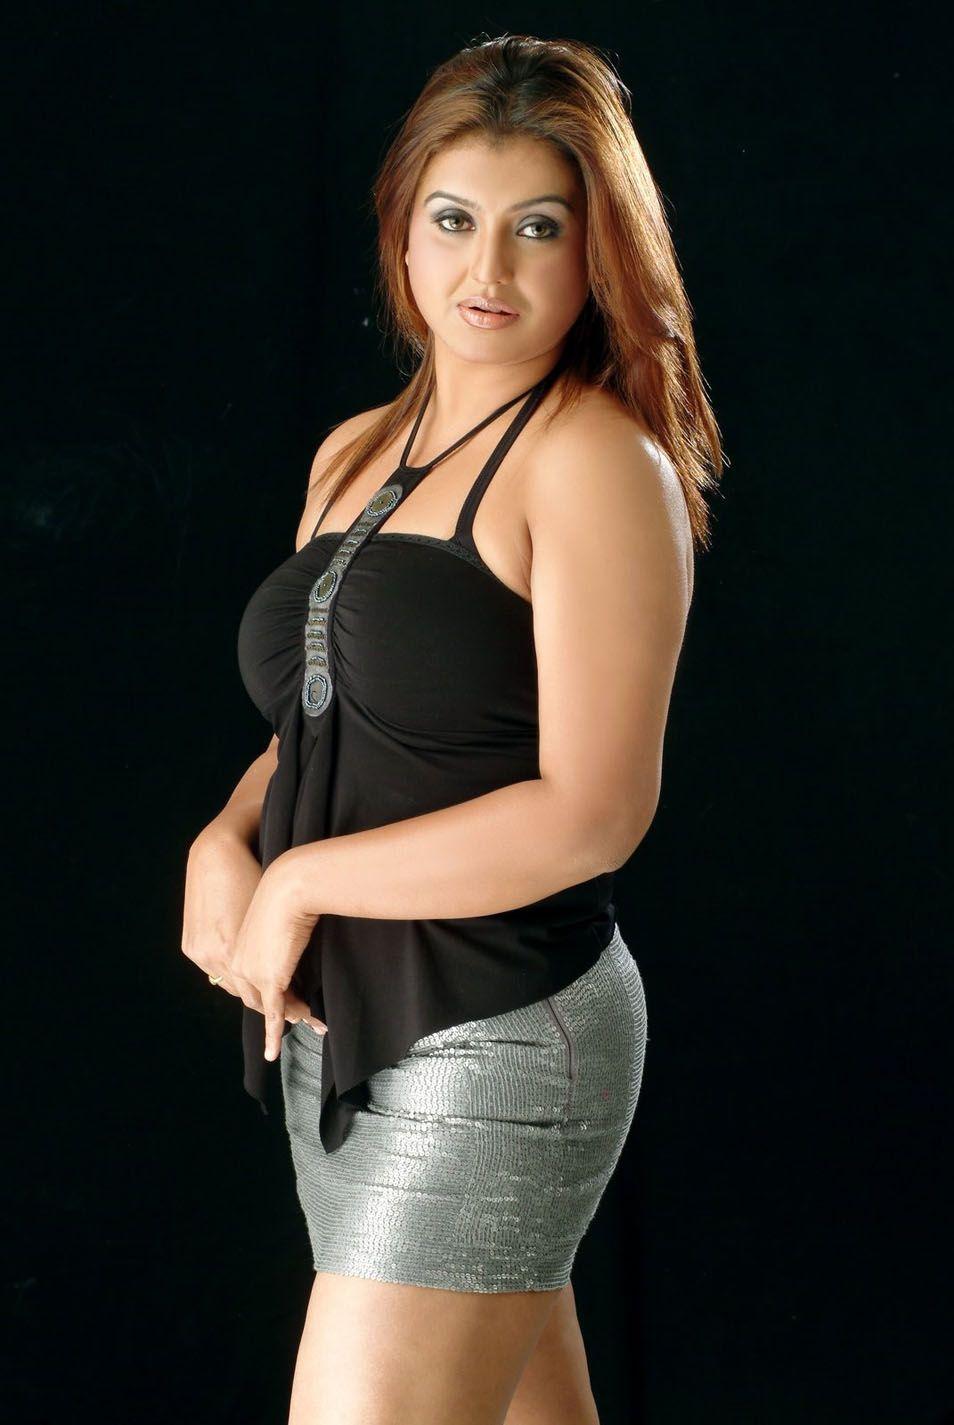 Actress Sexy Hollywood Hot#4